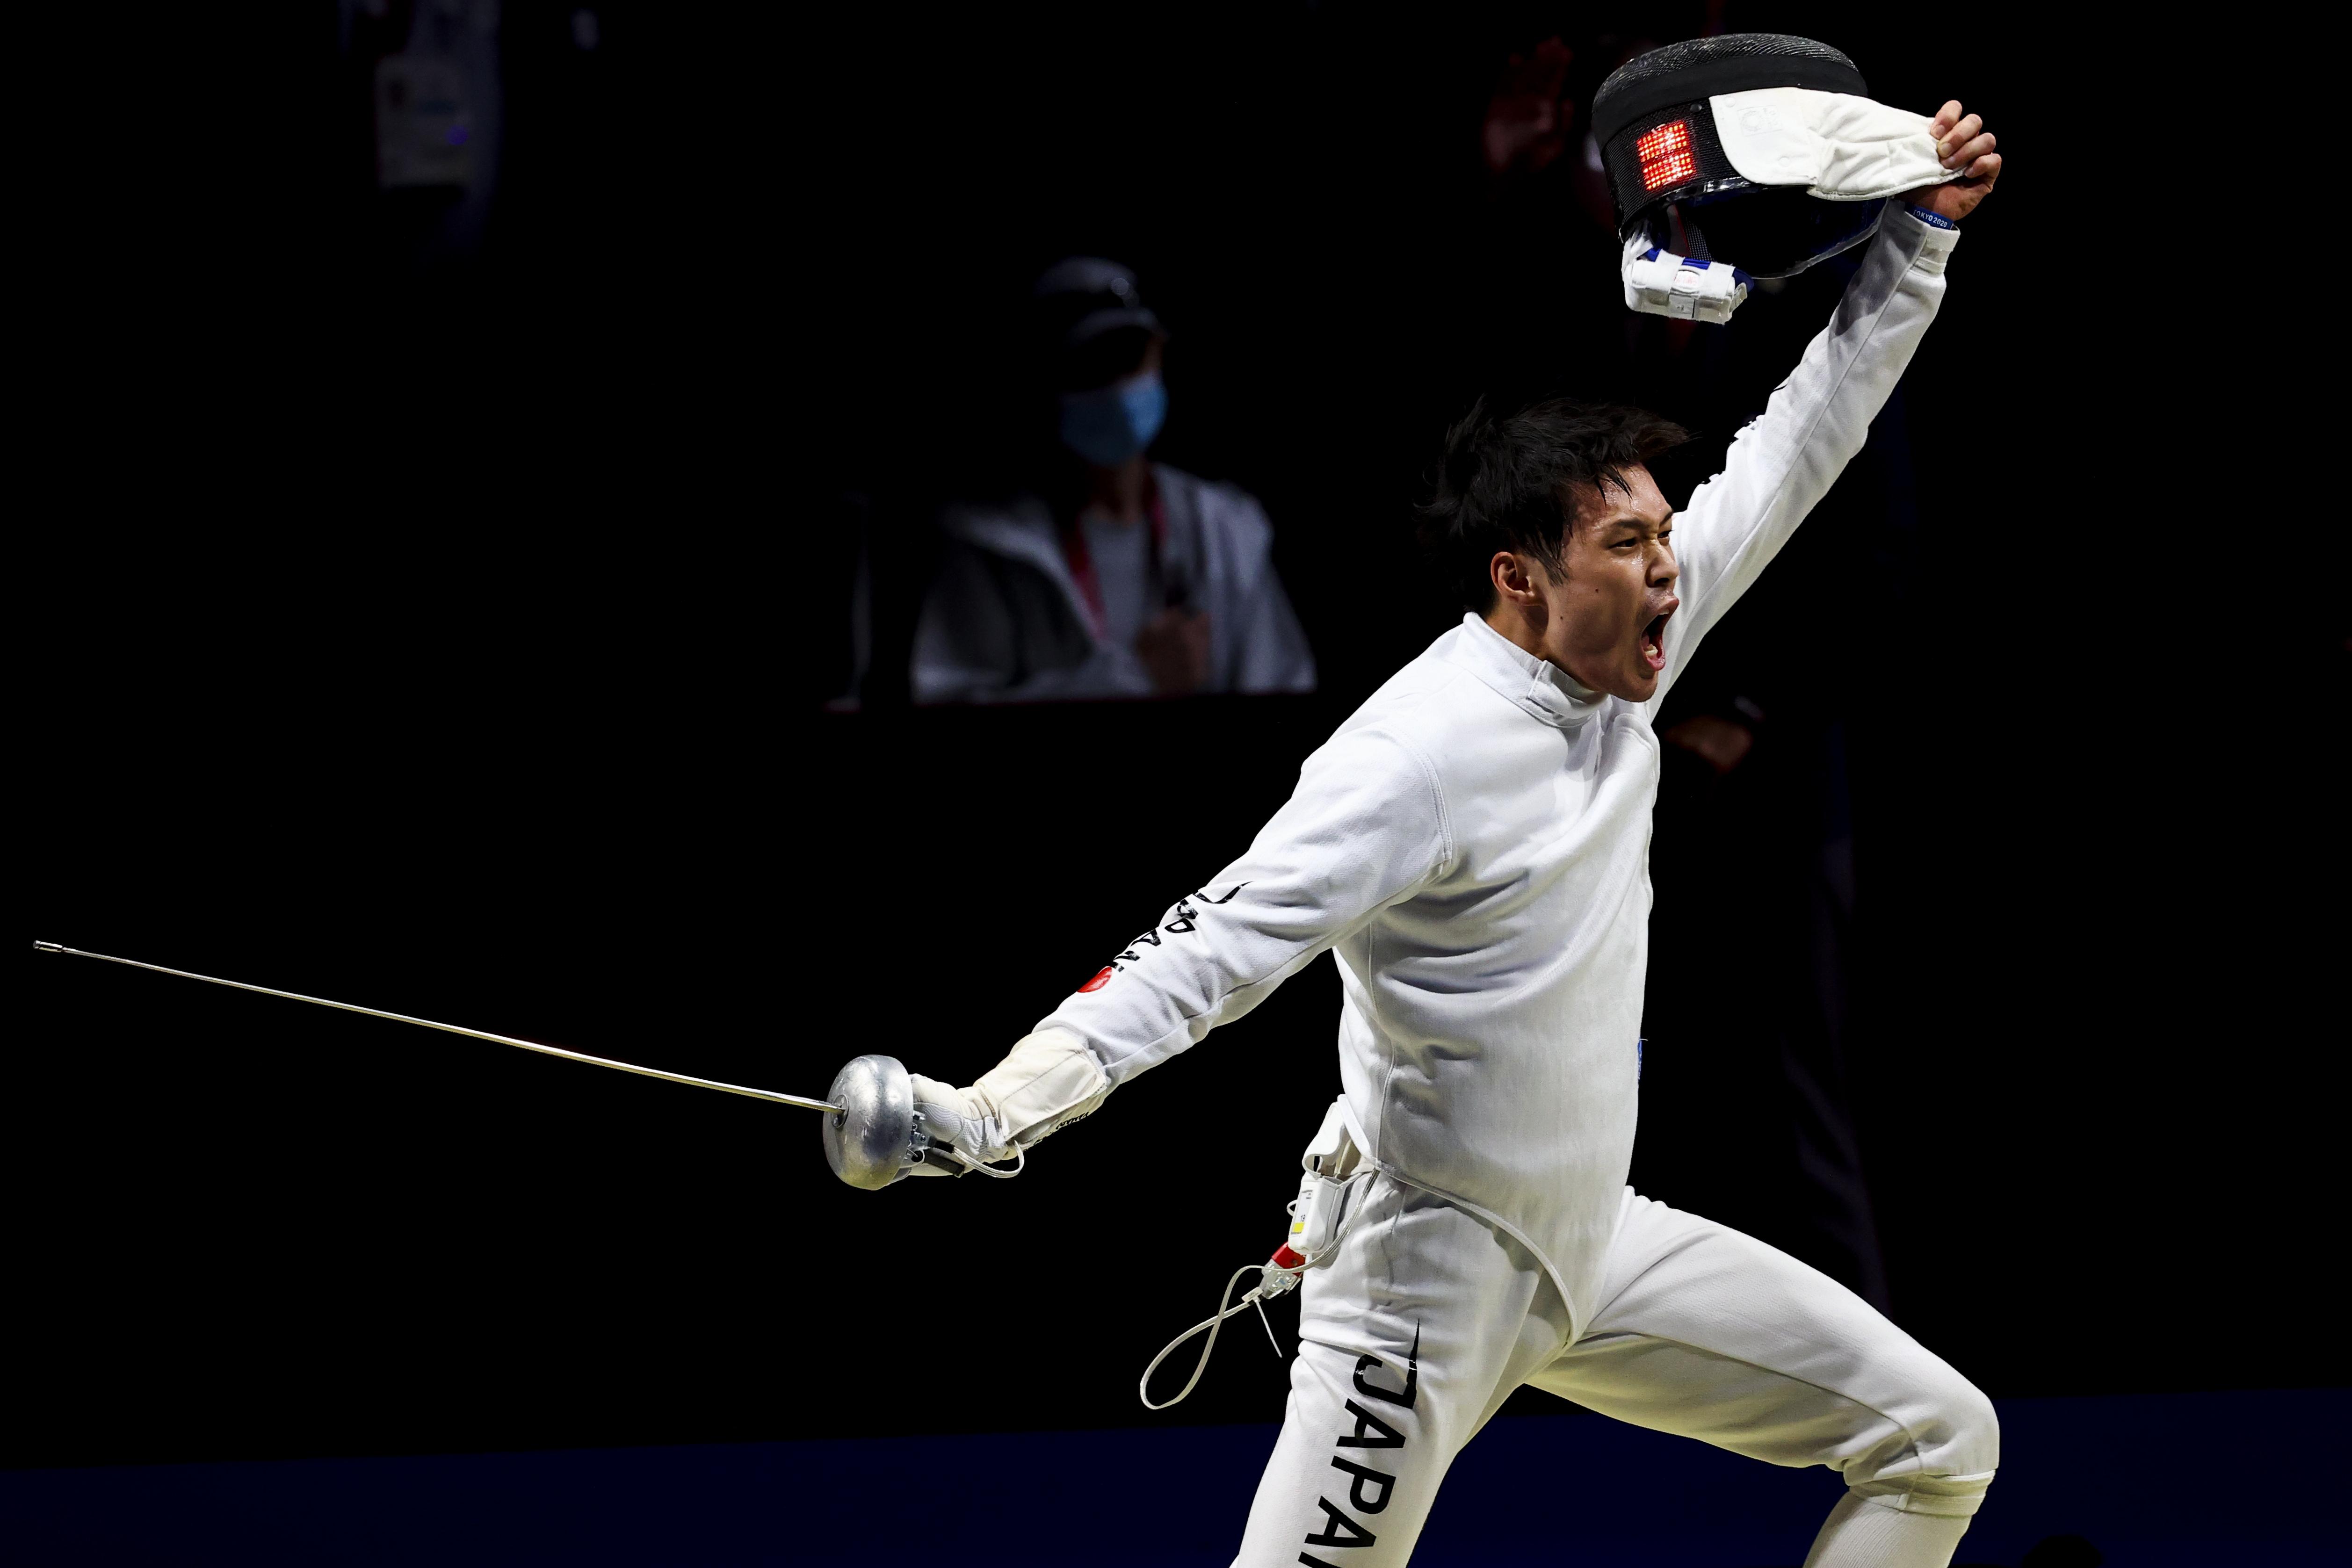 Tokyo 2020 Olympics - Fencing - Men's Individual Epee - Last 32 - Makuhari Messe Hall B - Chiba, Japan - July 25, 2021. Masaru Yamada of Japan celebrates after competing REUTERS/Maxim Shemetov